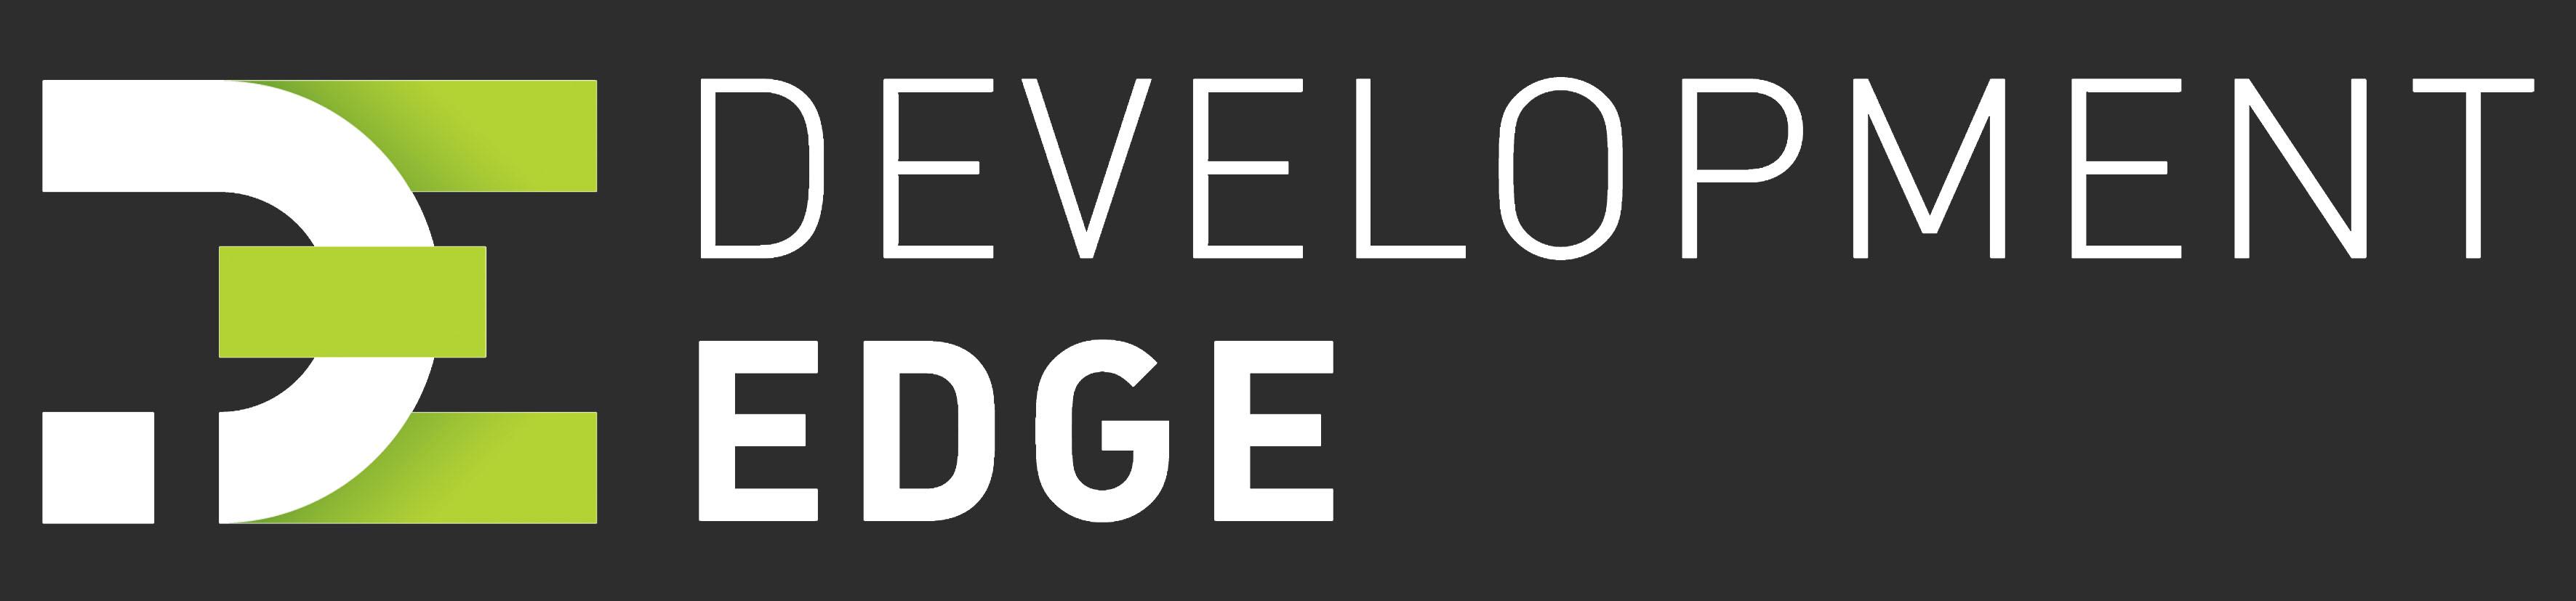 Development Edge